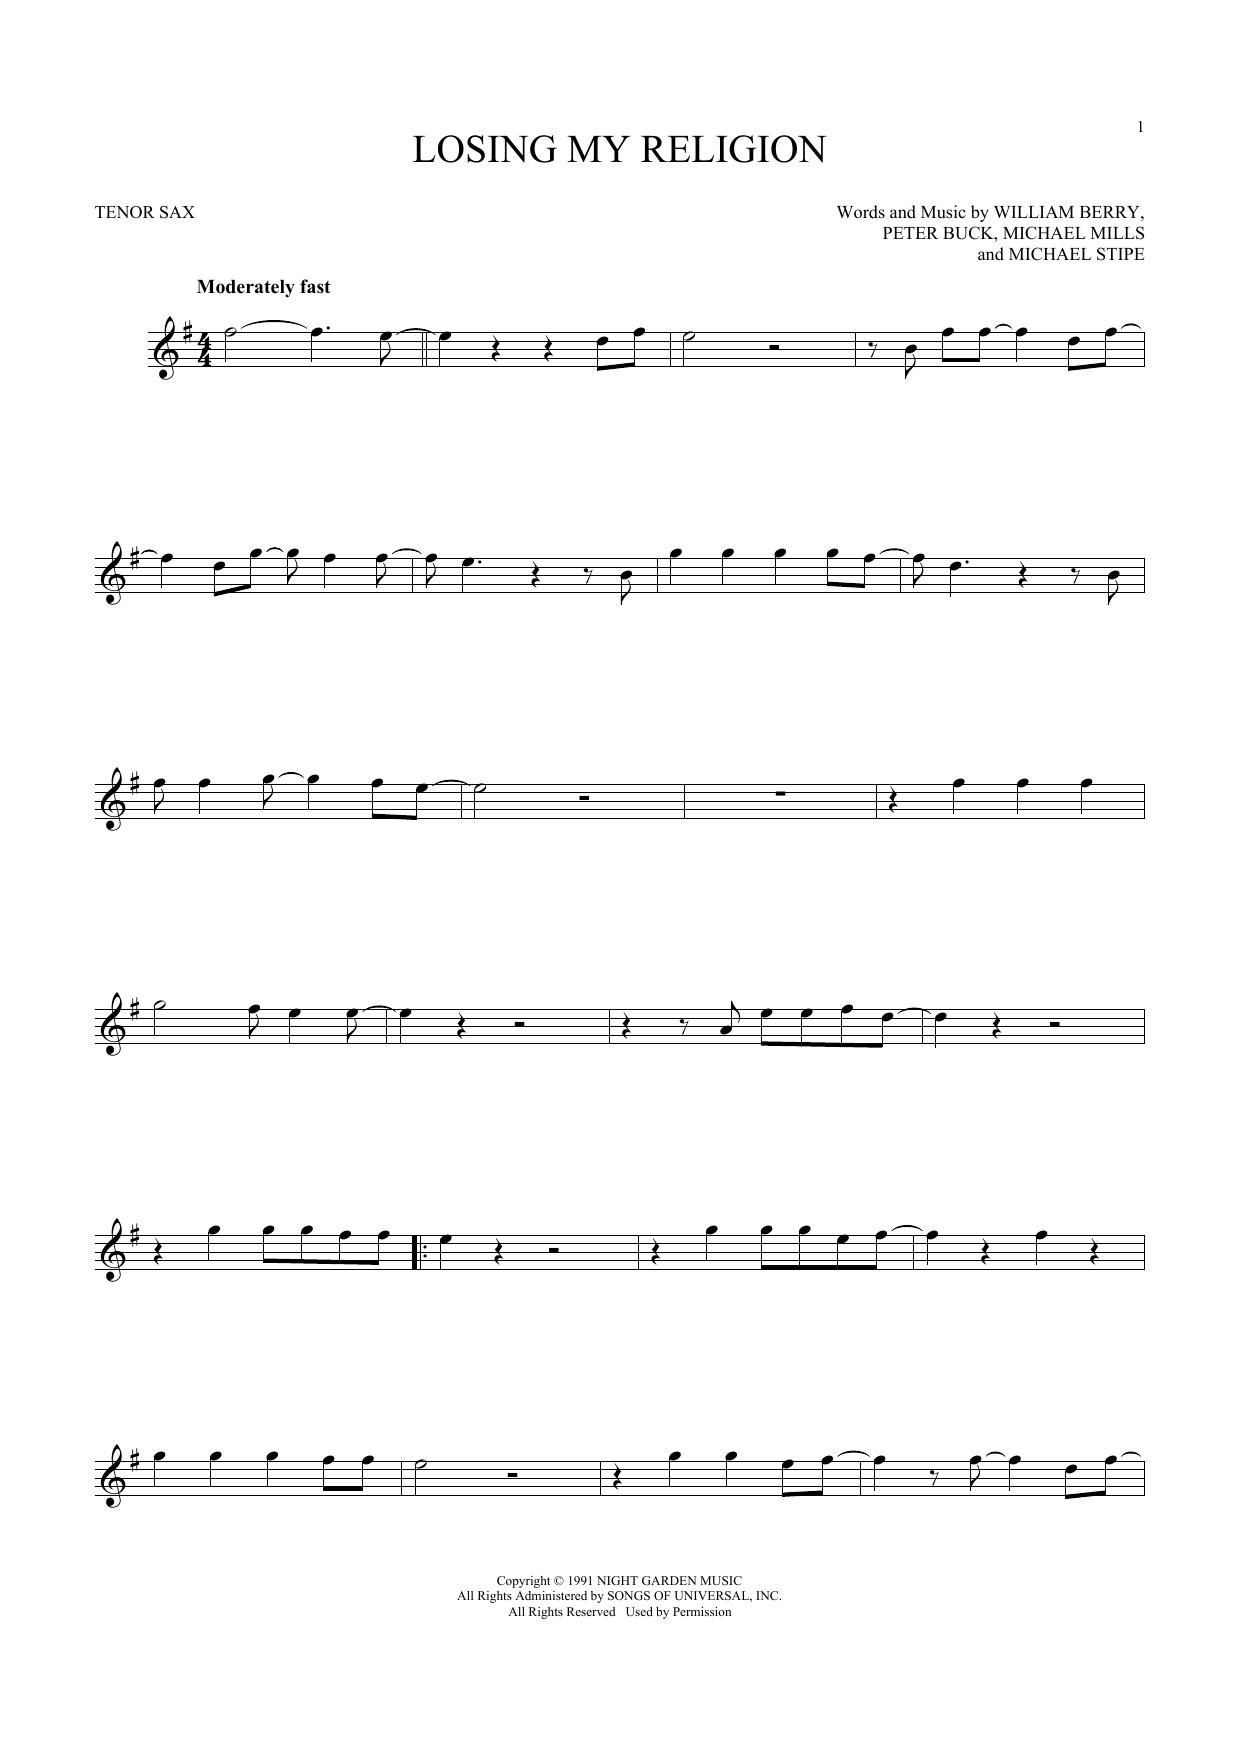 Losing My Religion (Tenor Saxophone)